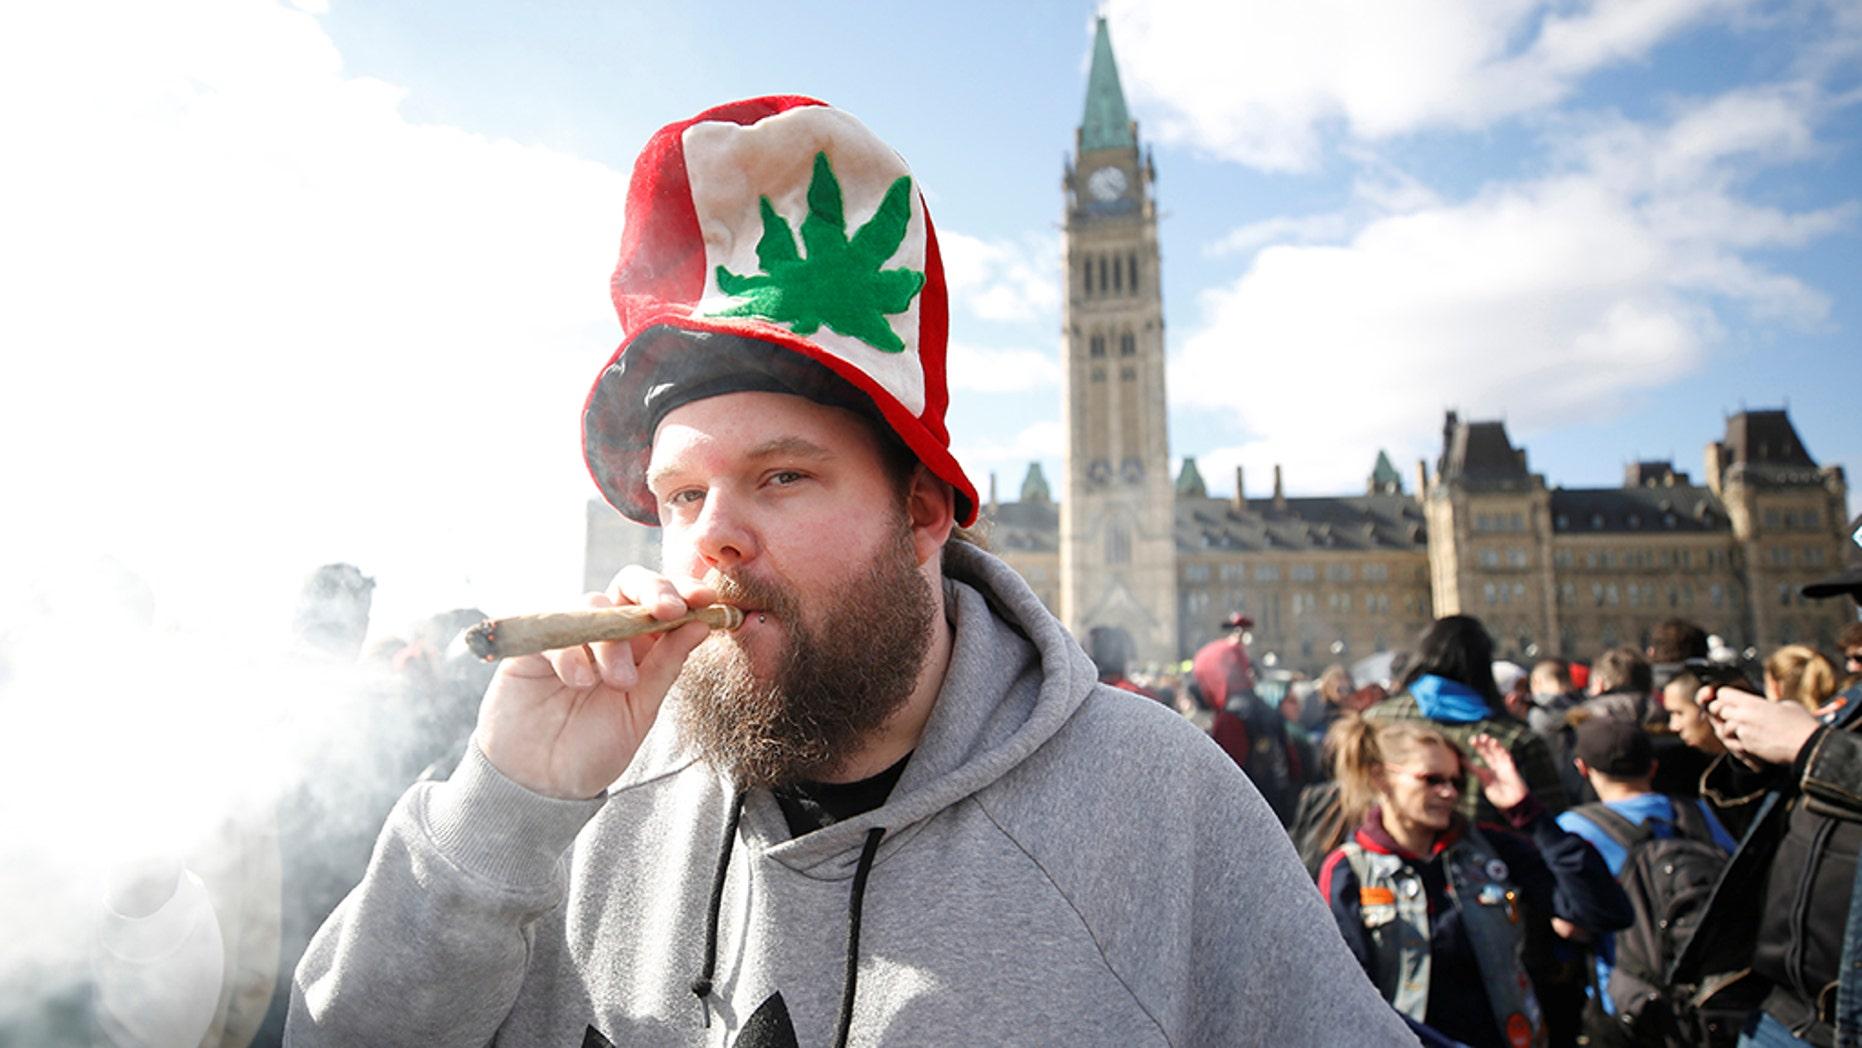 A man smokes marijuana during the annual 4/20 marijuana rally on Parliament Hill in Ottawa, Ontario, Canada, April 20, 2018